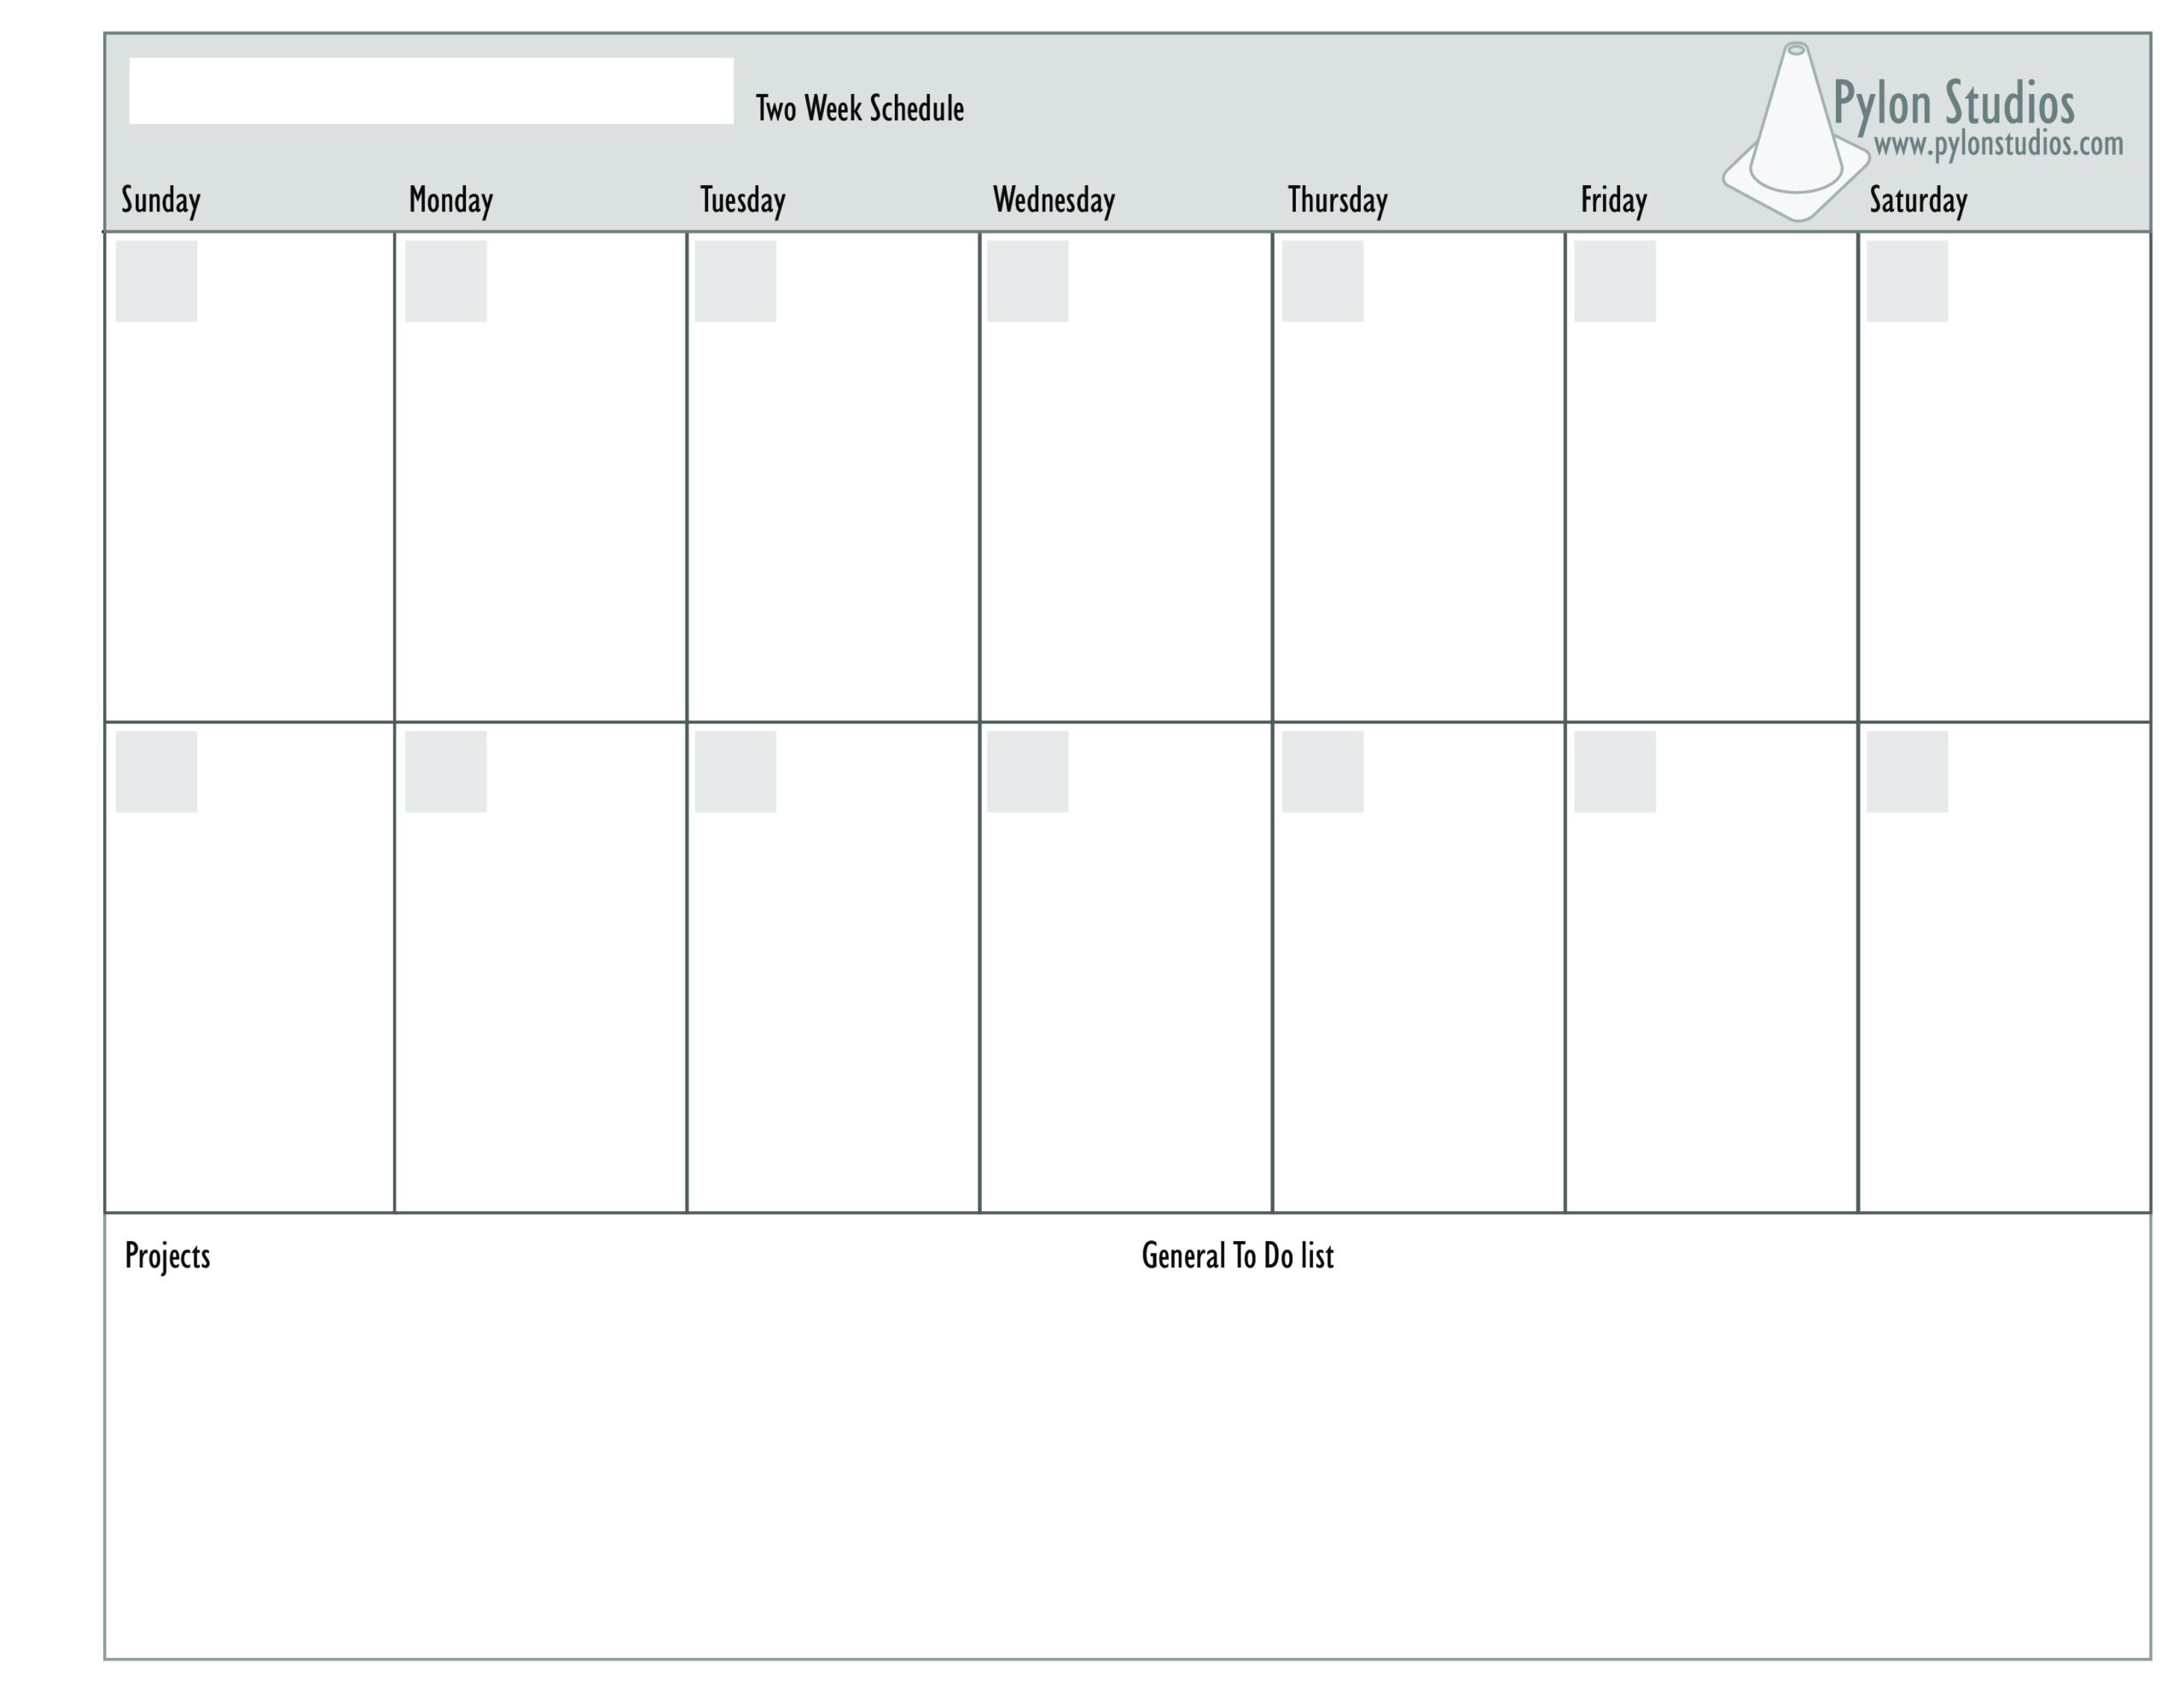 2 Week Calendar - How To Create A 2 Week Calendar? Download